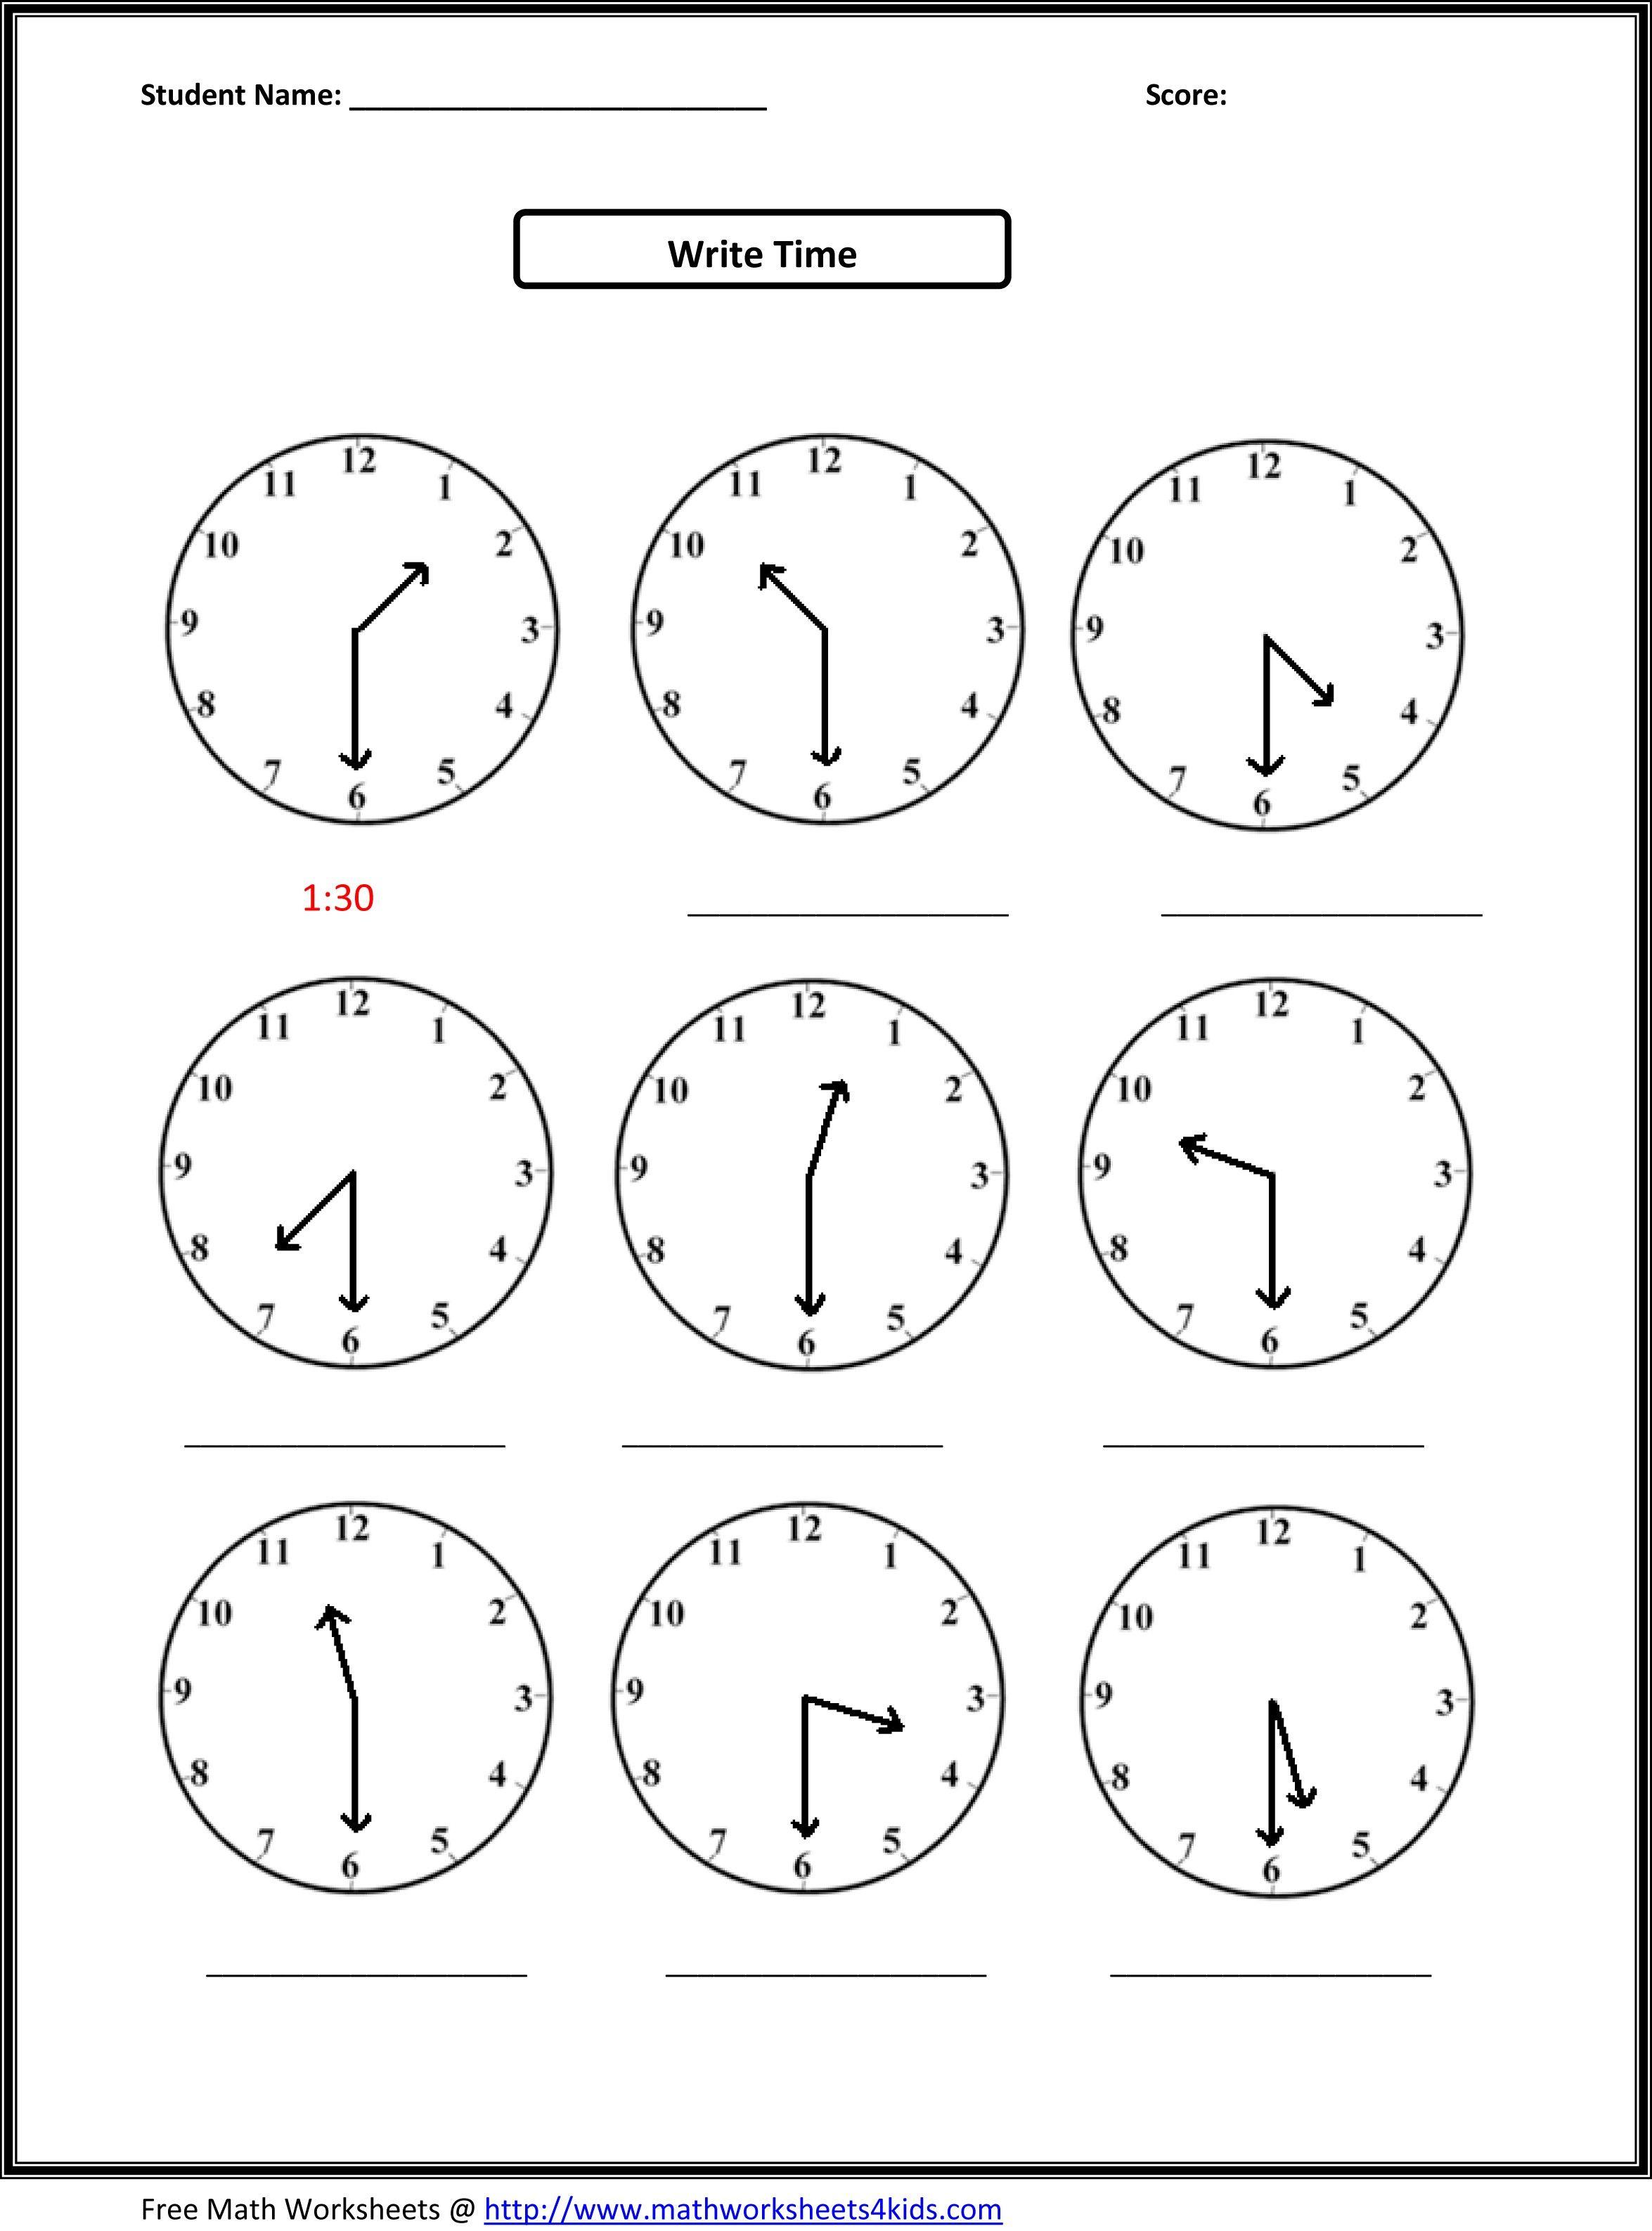 2Nd Grade Free Worksheets Math | Math: Time/measurement | 2Nd Grade | Free Printable Worksheets For Math 2Nd Grade